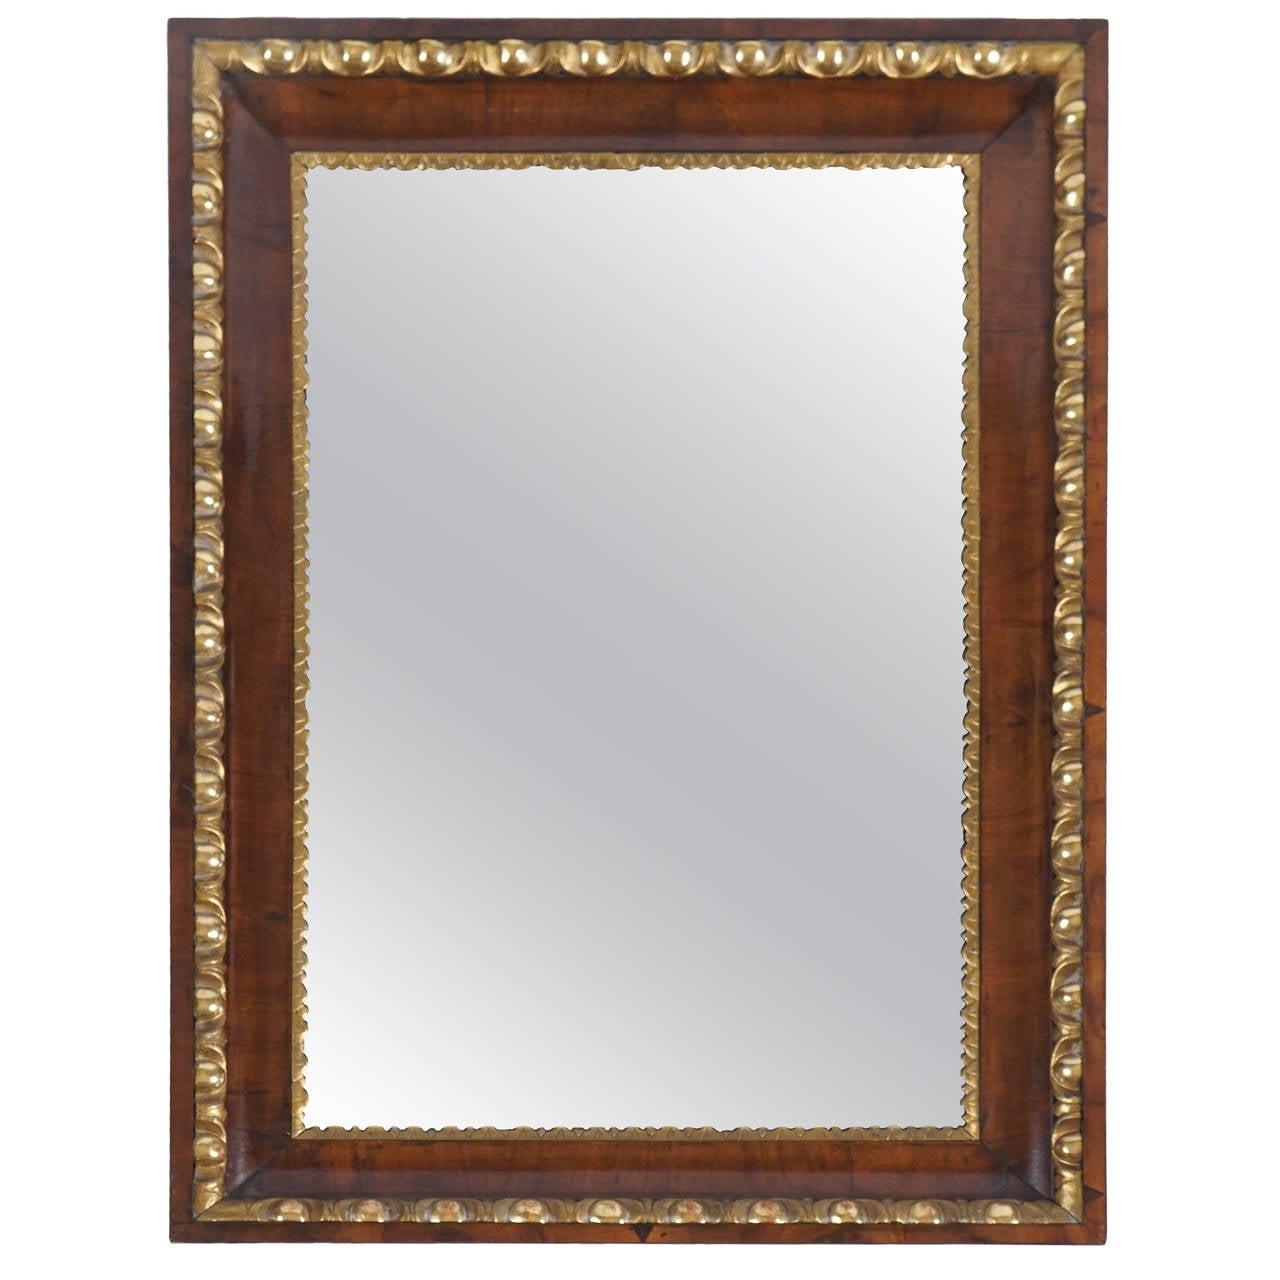 Walnut Parcel Gilt Biedermeier Mirror, Austria, circa 1820